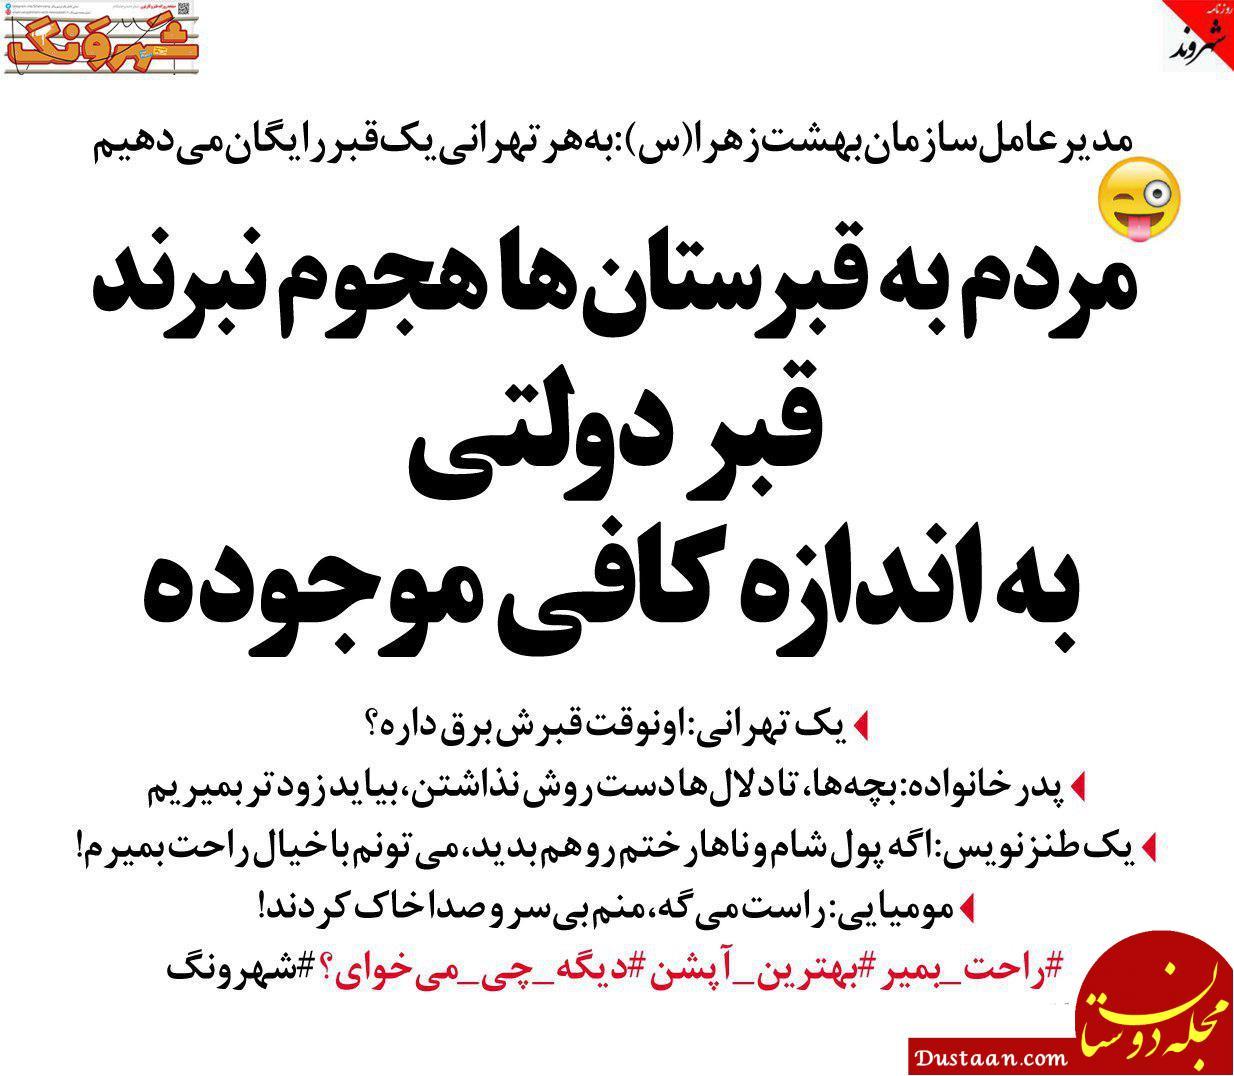 www.dustaan.com سامانه قبر دولتی هم راه افتاد!؟ +عکس